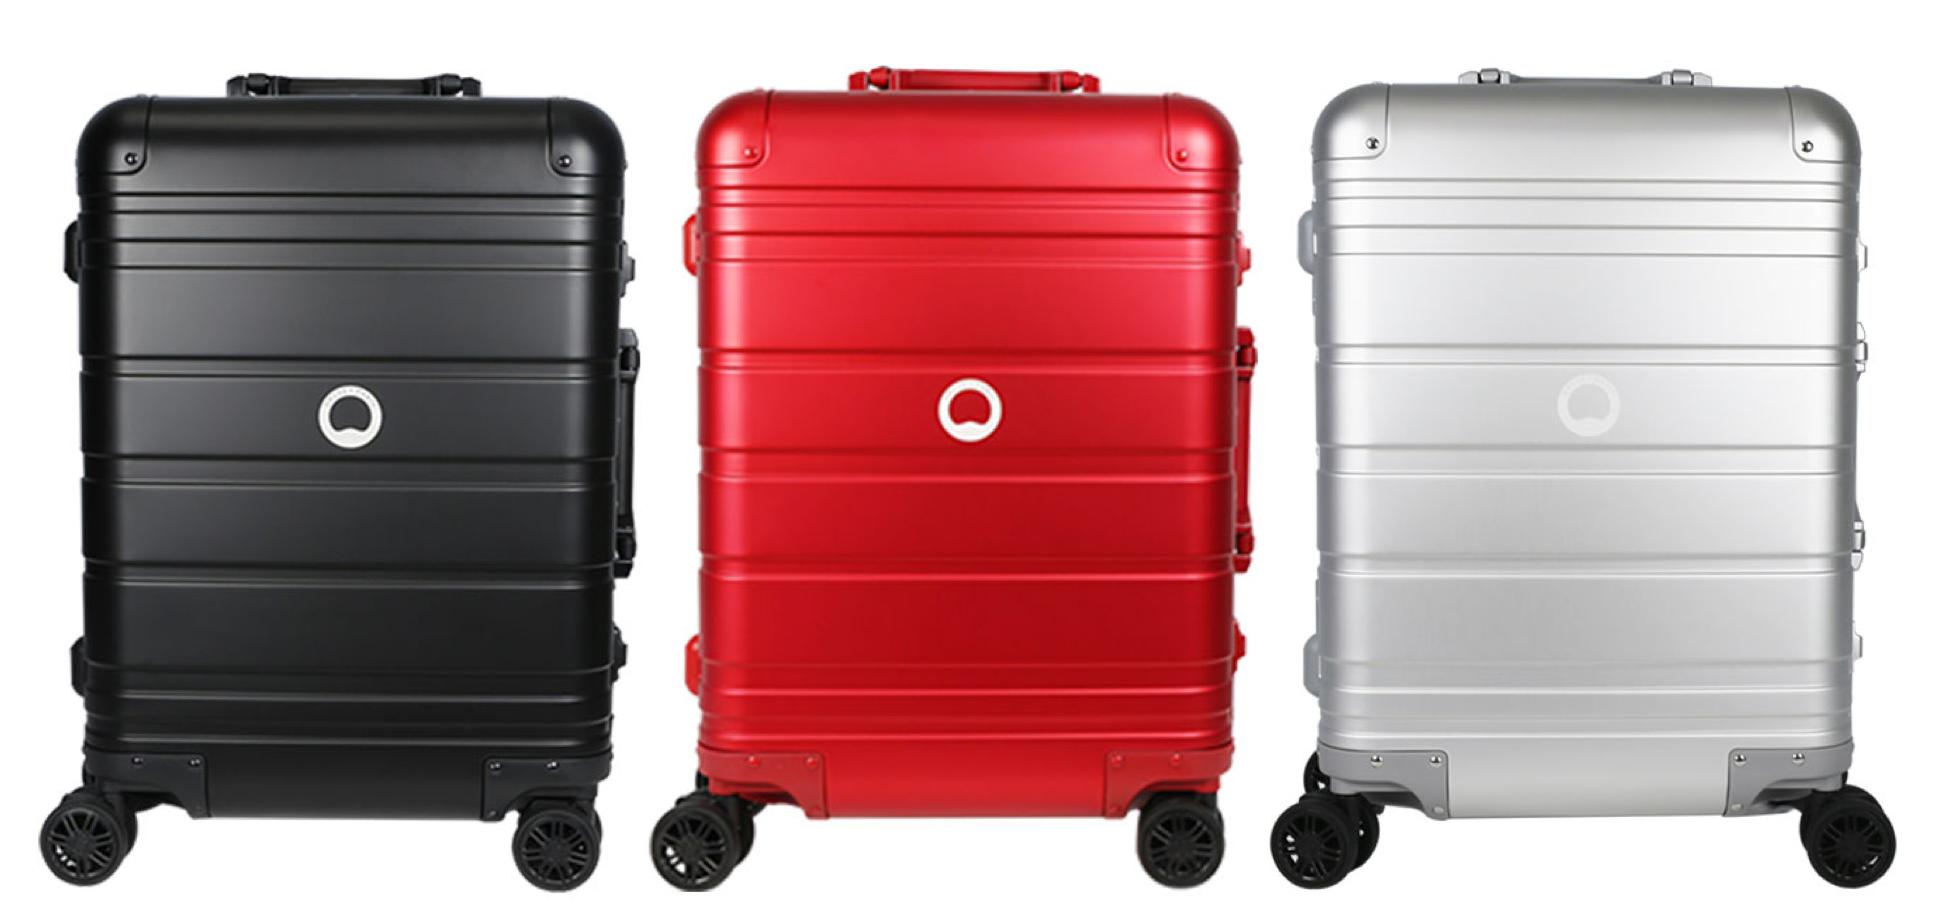 DELSEY 五款箱包齐上新,为消费者打造多彩梦想之旅